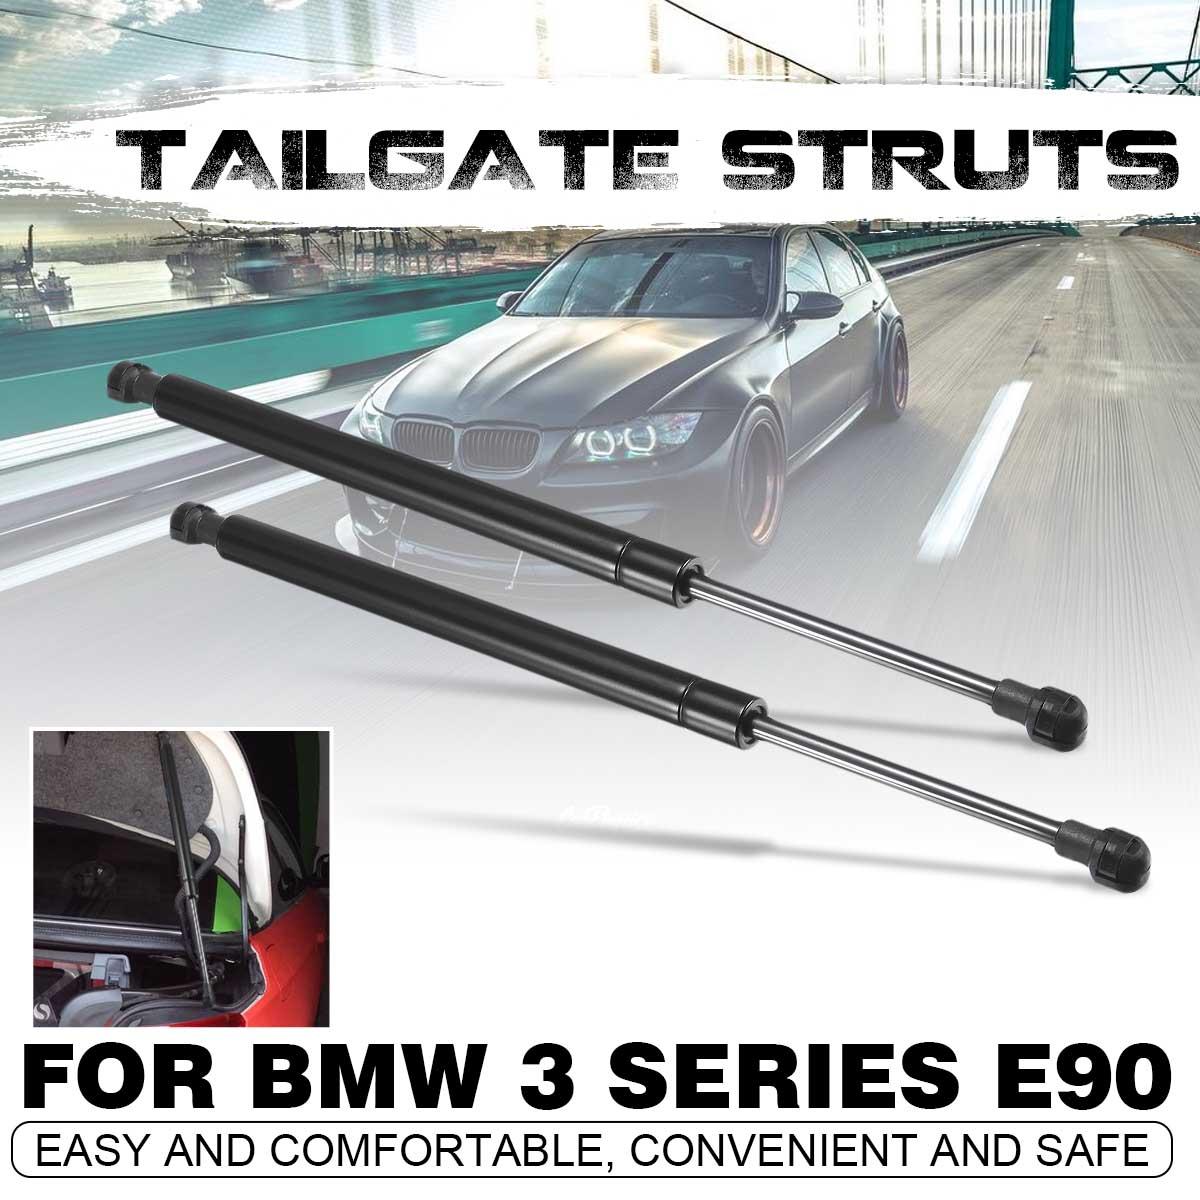 2X 38.5cm Tailgate Boot Trunk Gas Spring Hood Lift Shock Struts  For BMW 3 Series E90 E91 E92 E93 2005-2013